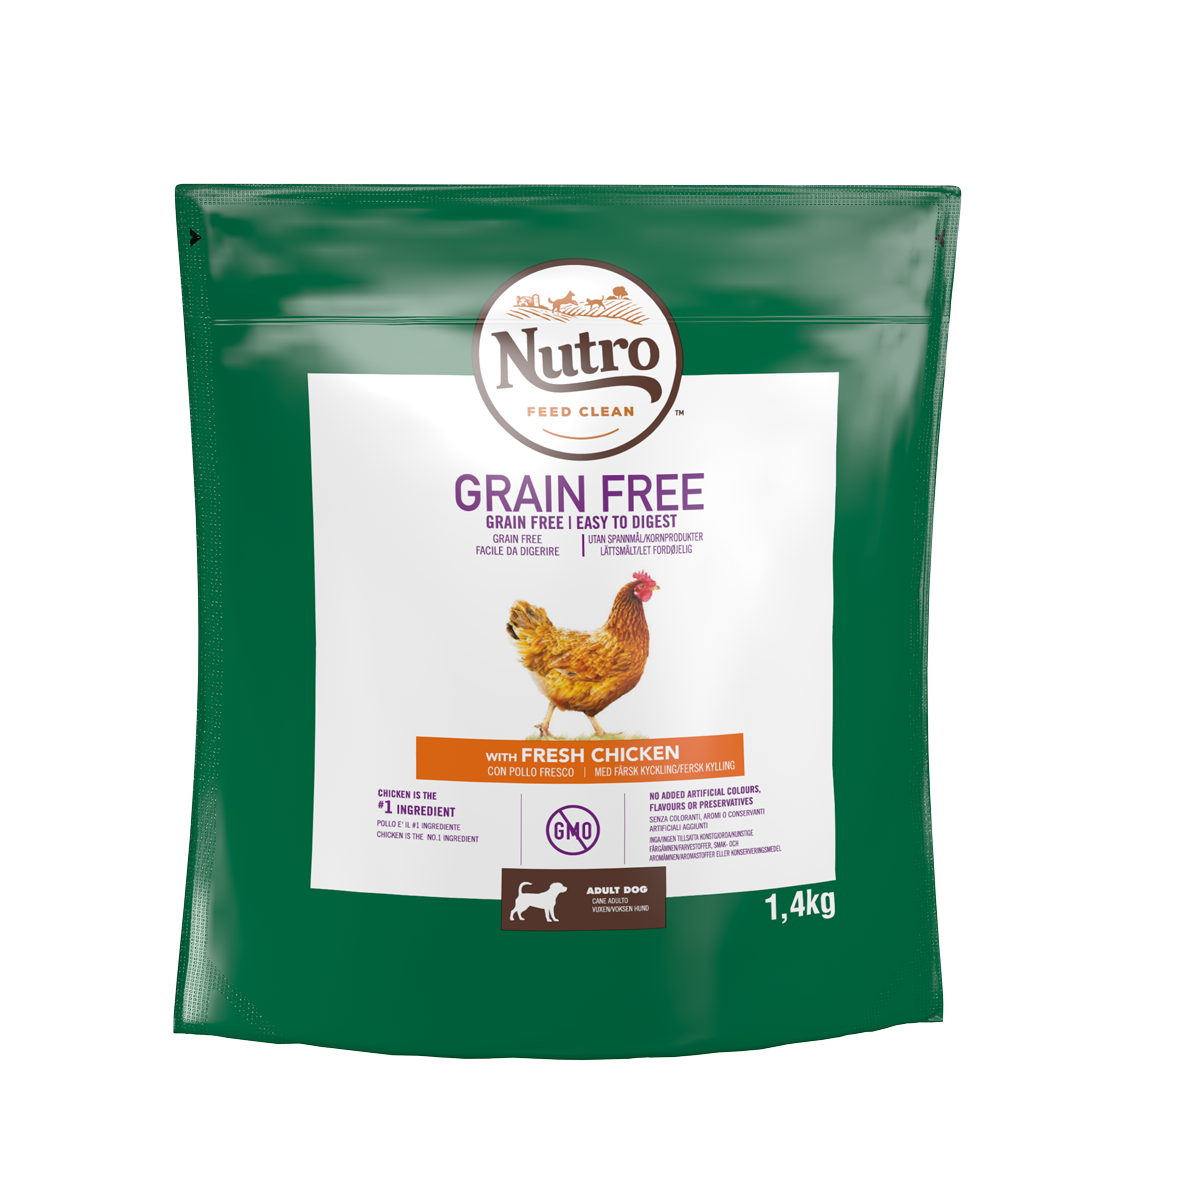 Image of Nutro Grain Free Adult Small Pollo: 1,4 Kg